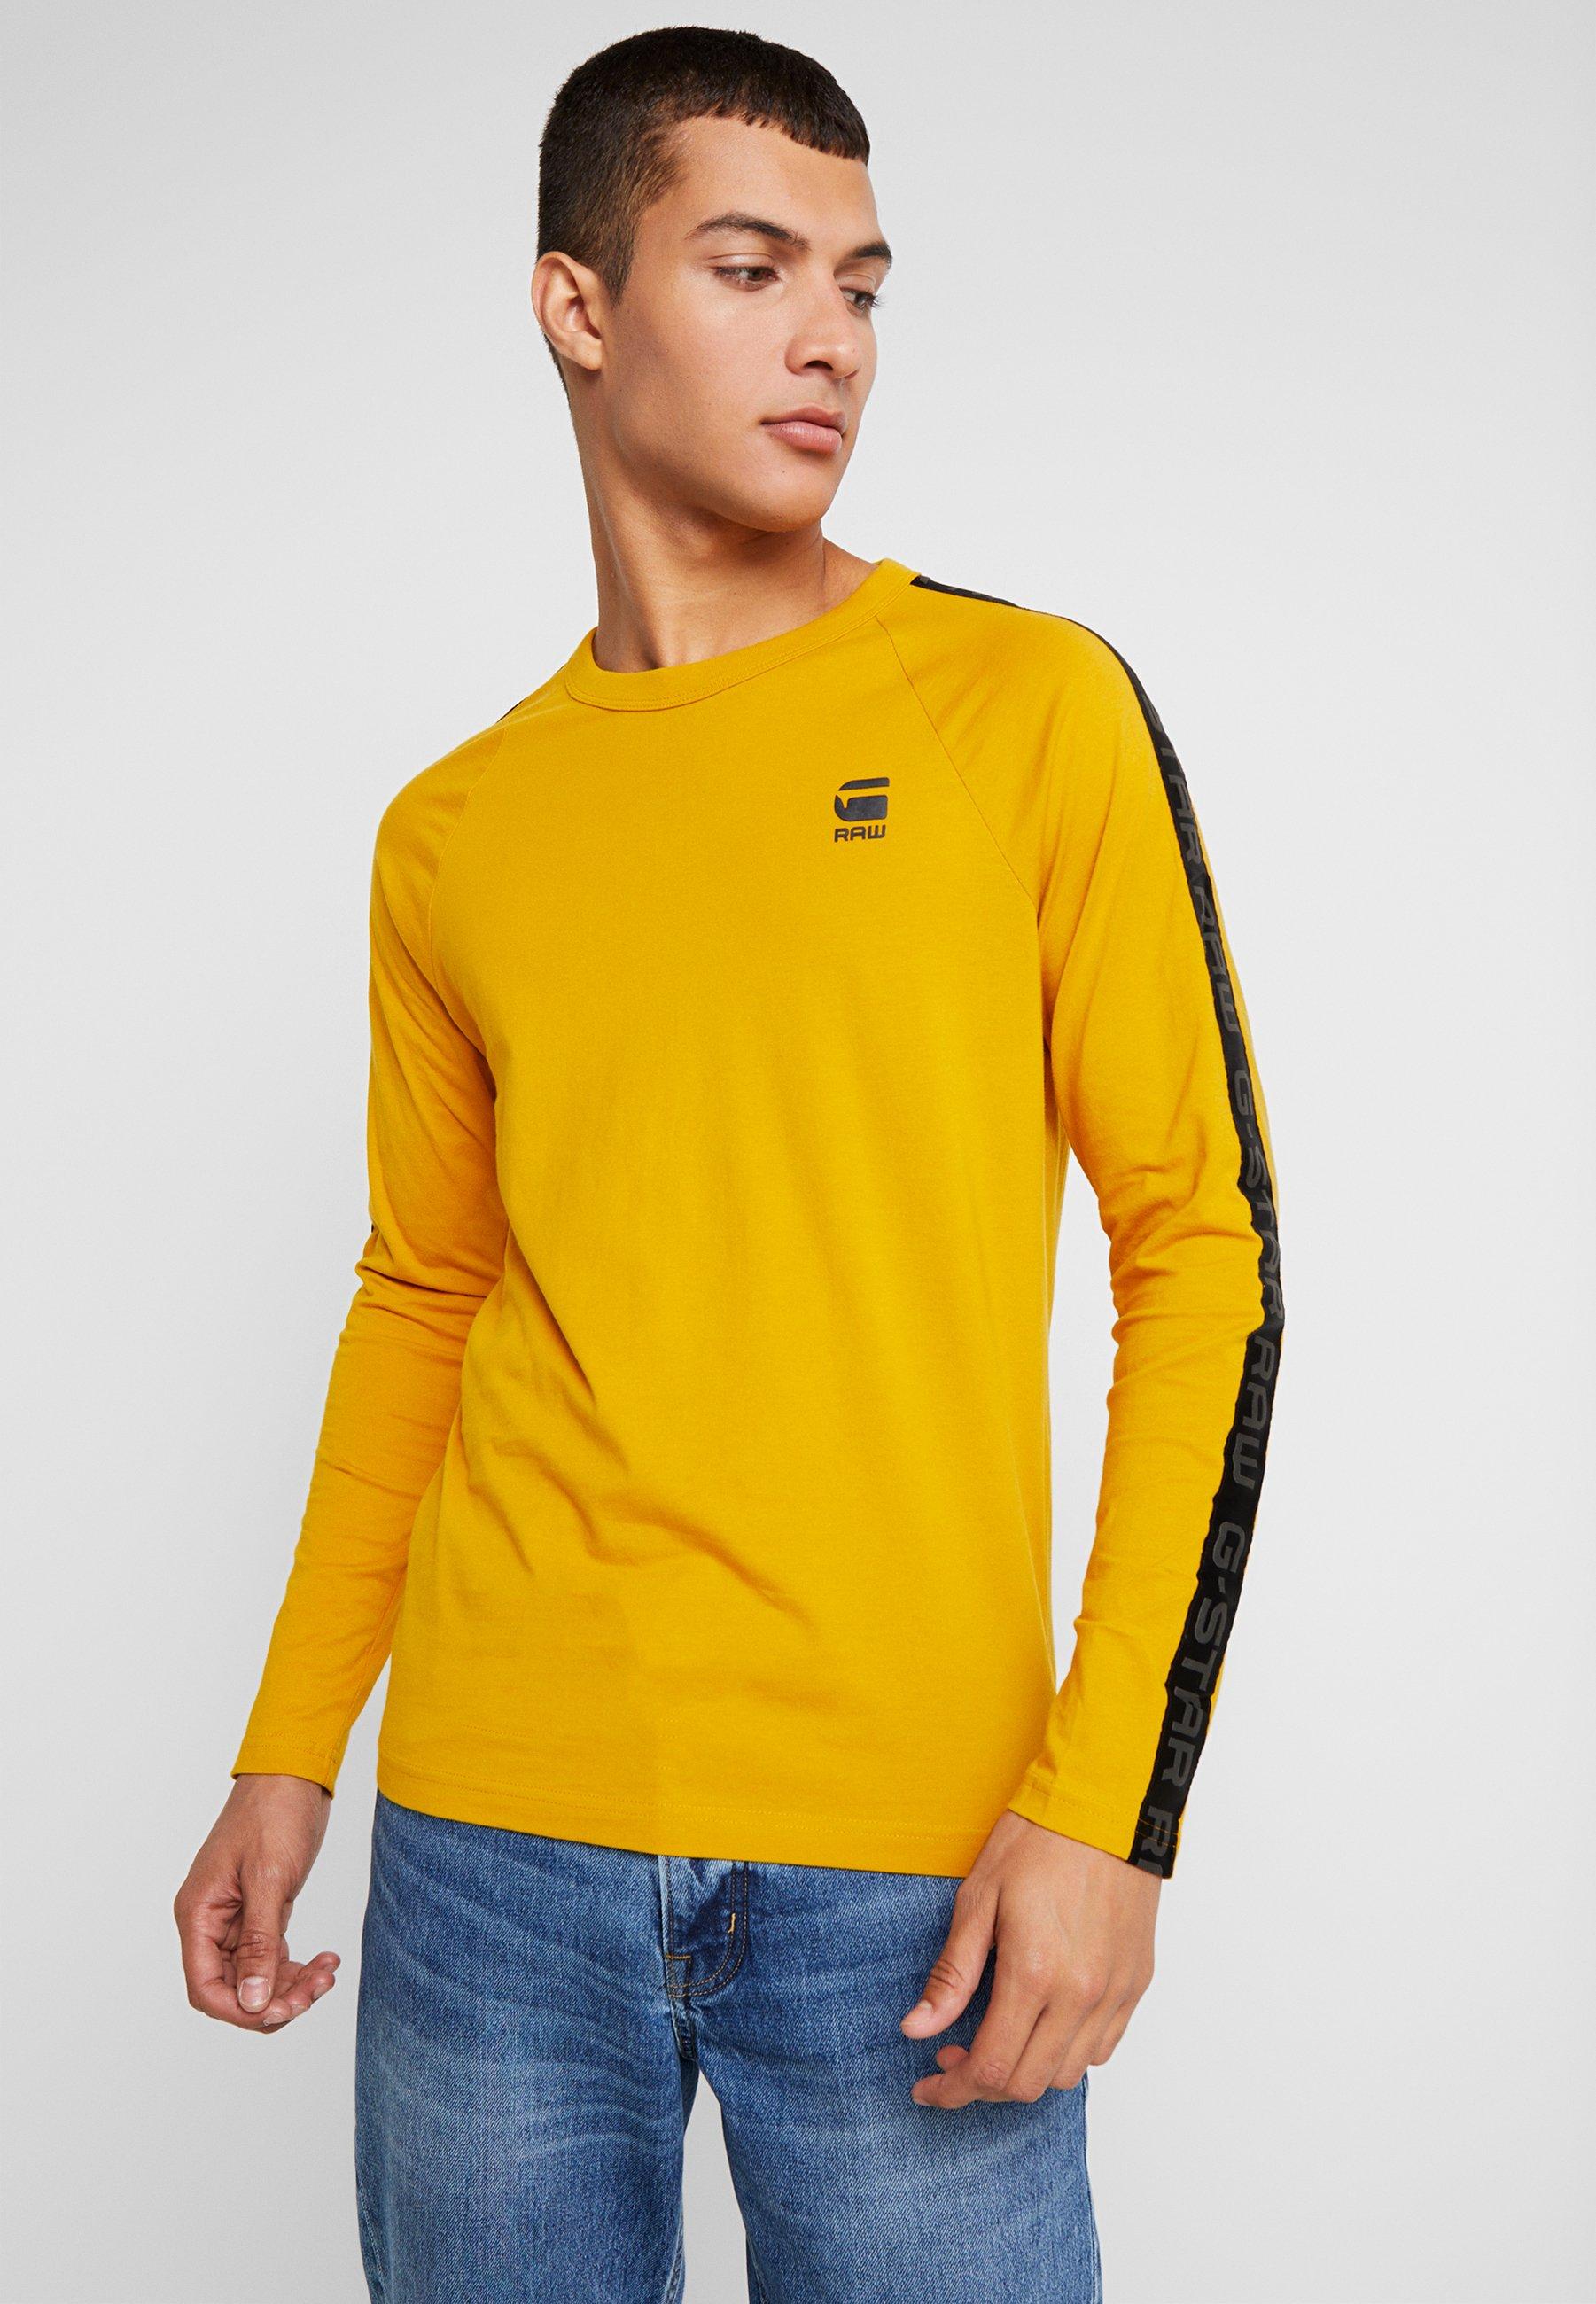 star G shirt À Raglan L Gold Dark sT Manches Longues Satur R T qSVpUzM